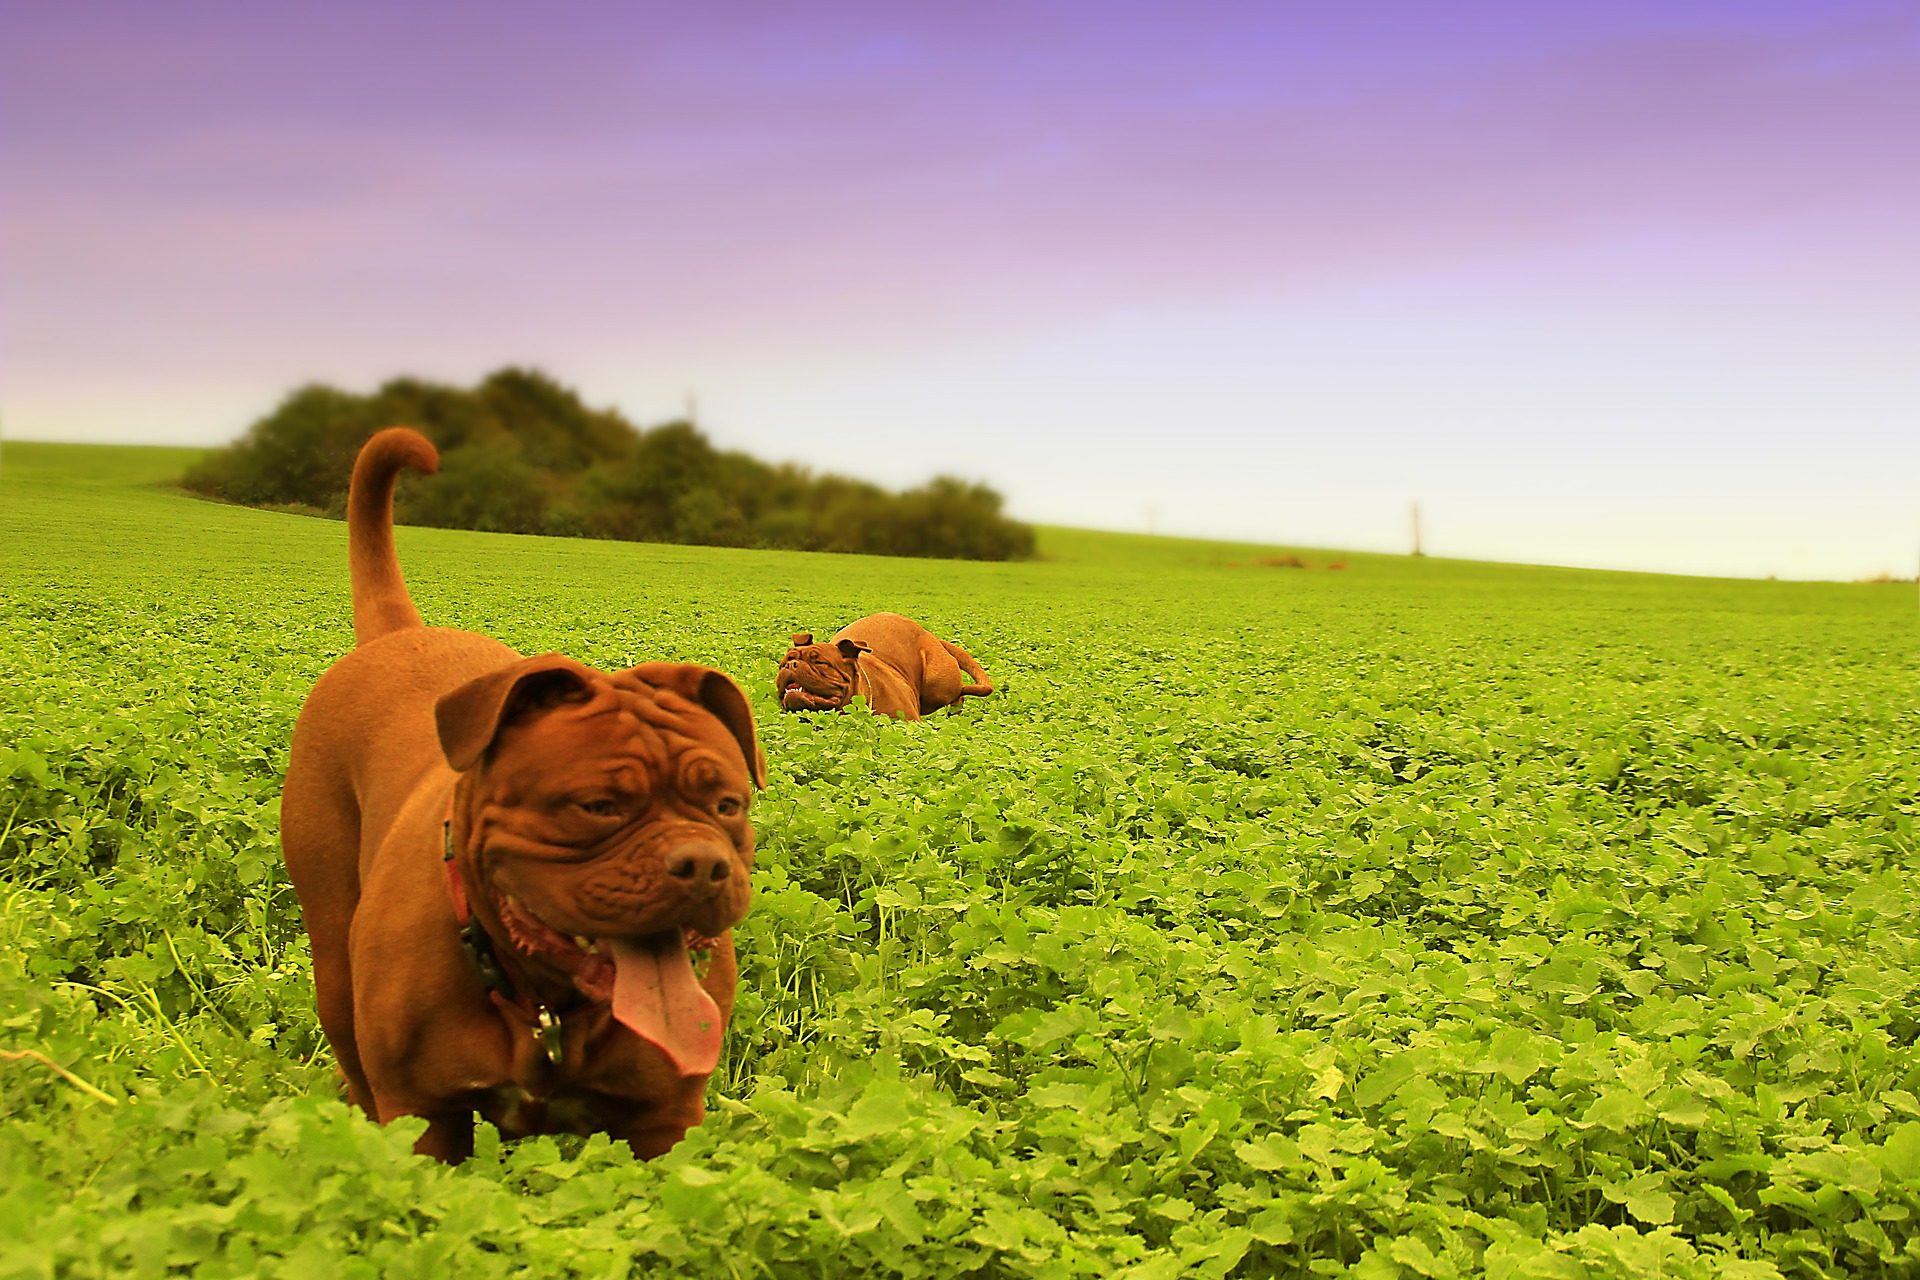 perro, dogo, burdeos, mascota, campo, juego - Fondos de Pantalla HD - professor-falken.com